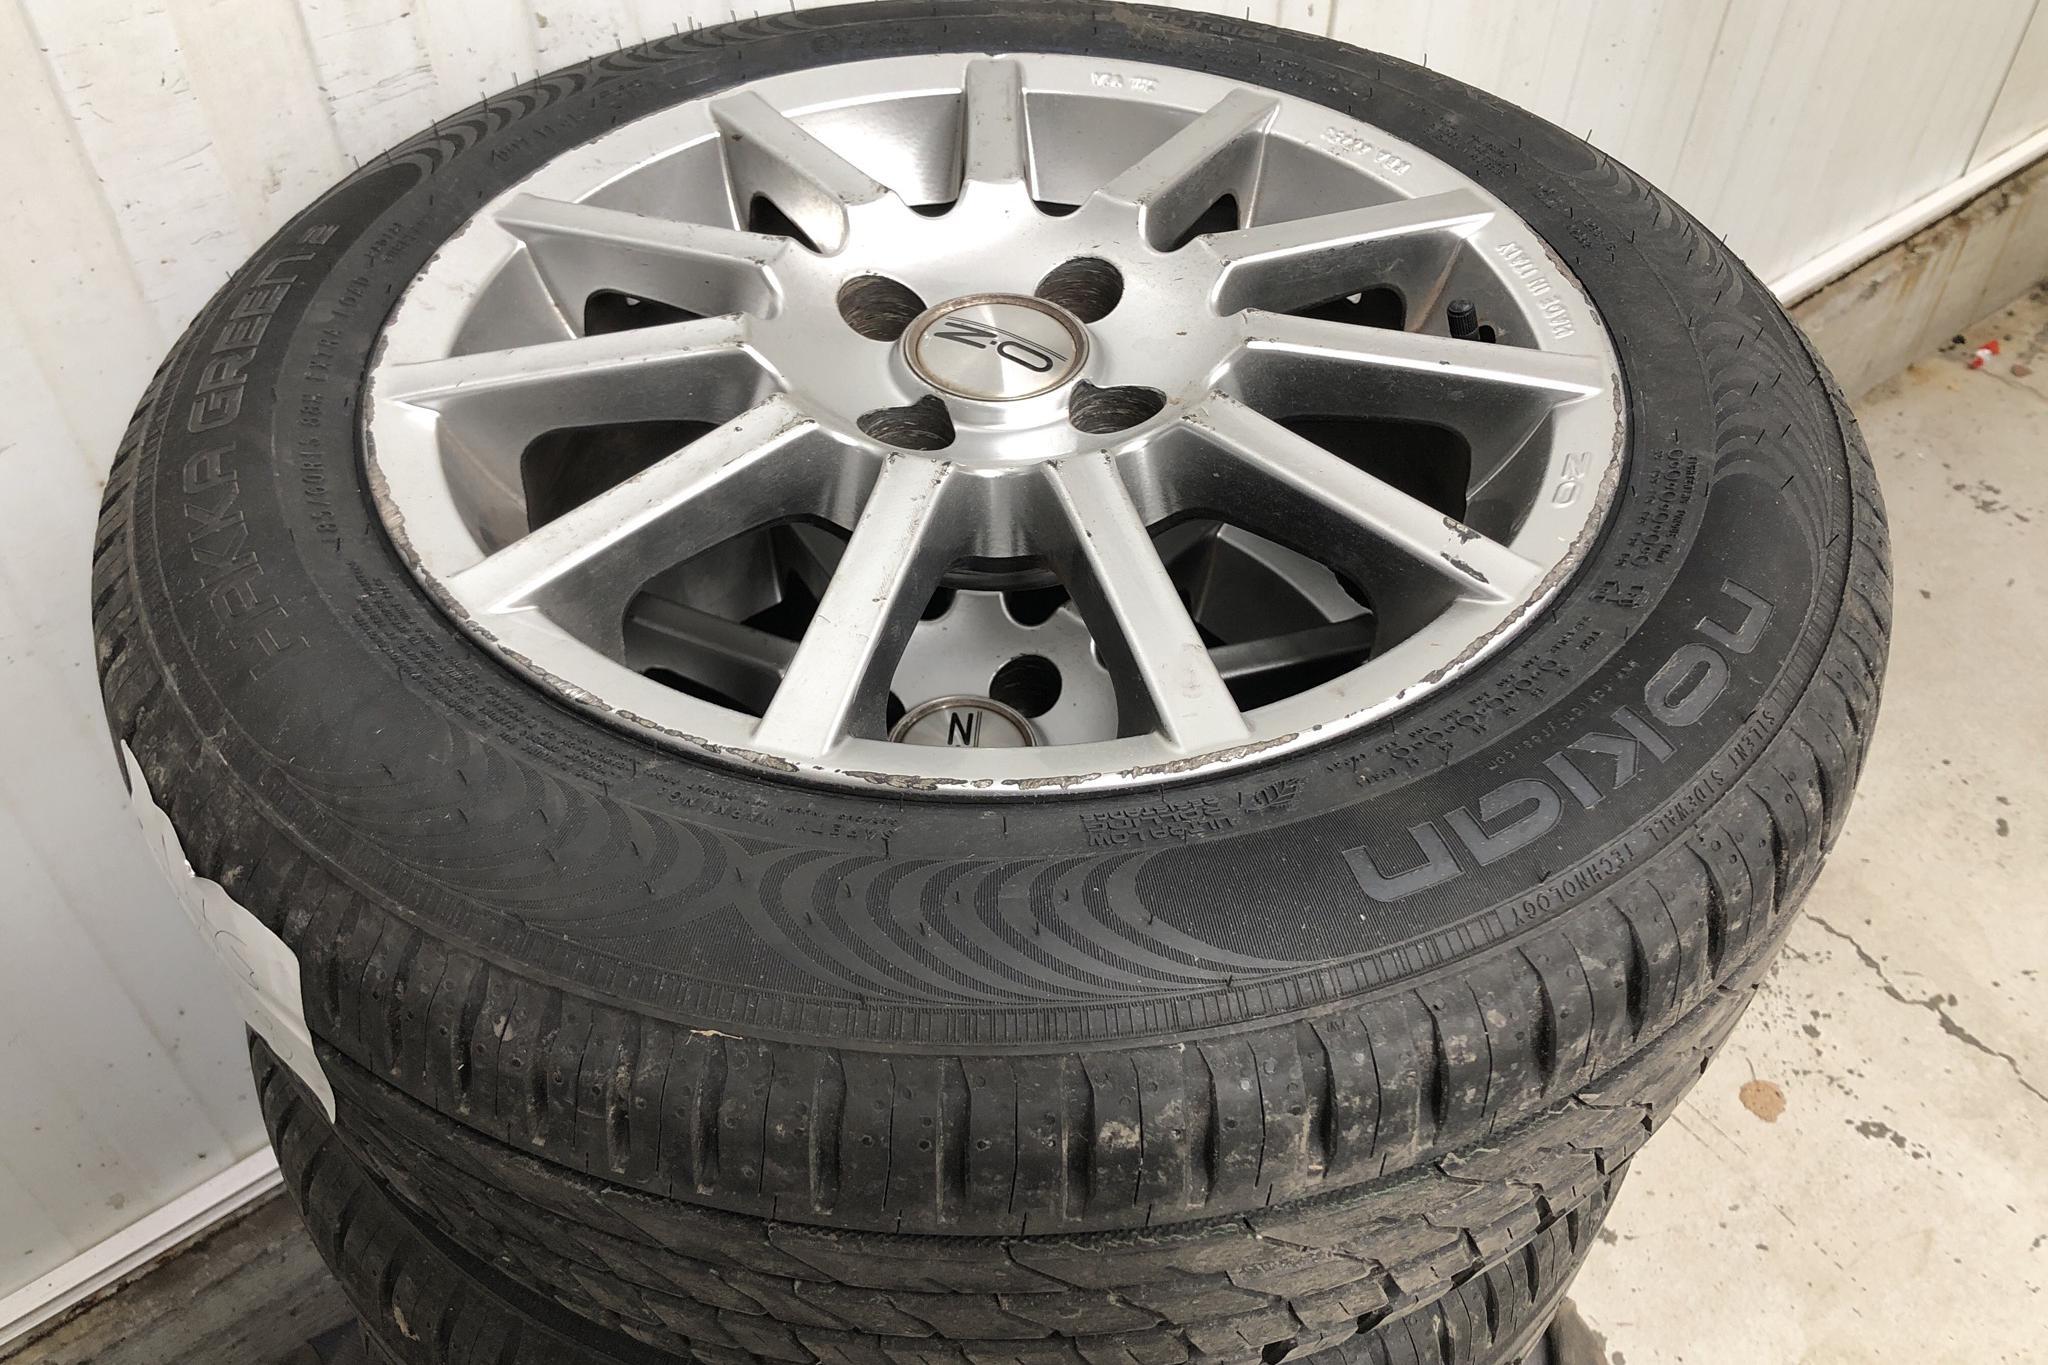 Toyota Yaris 1.3 5dr (87hk) - 5 452 mil - Manuell - grå - 2006